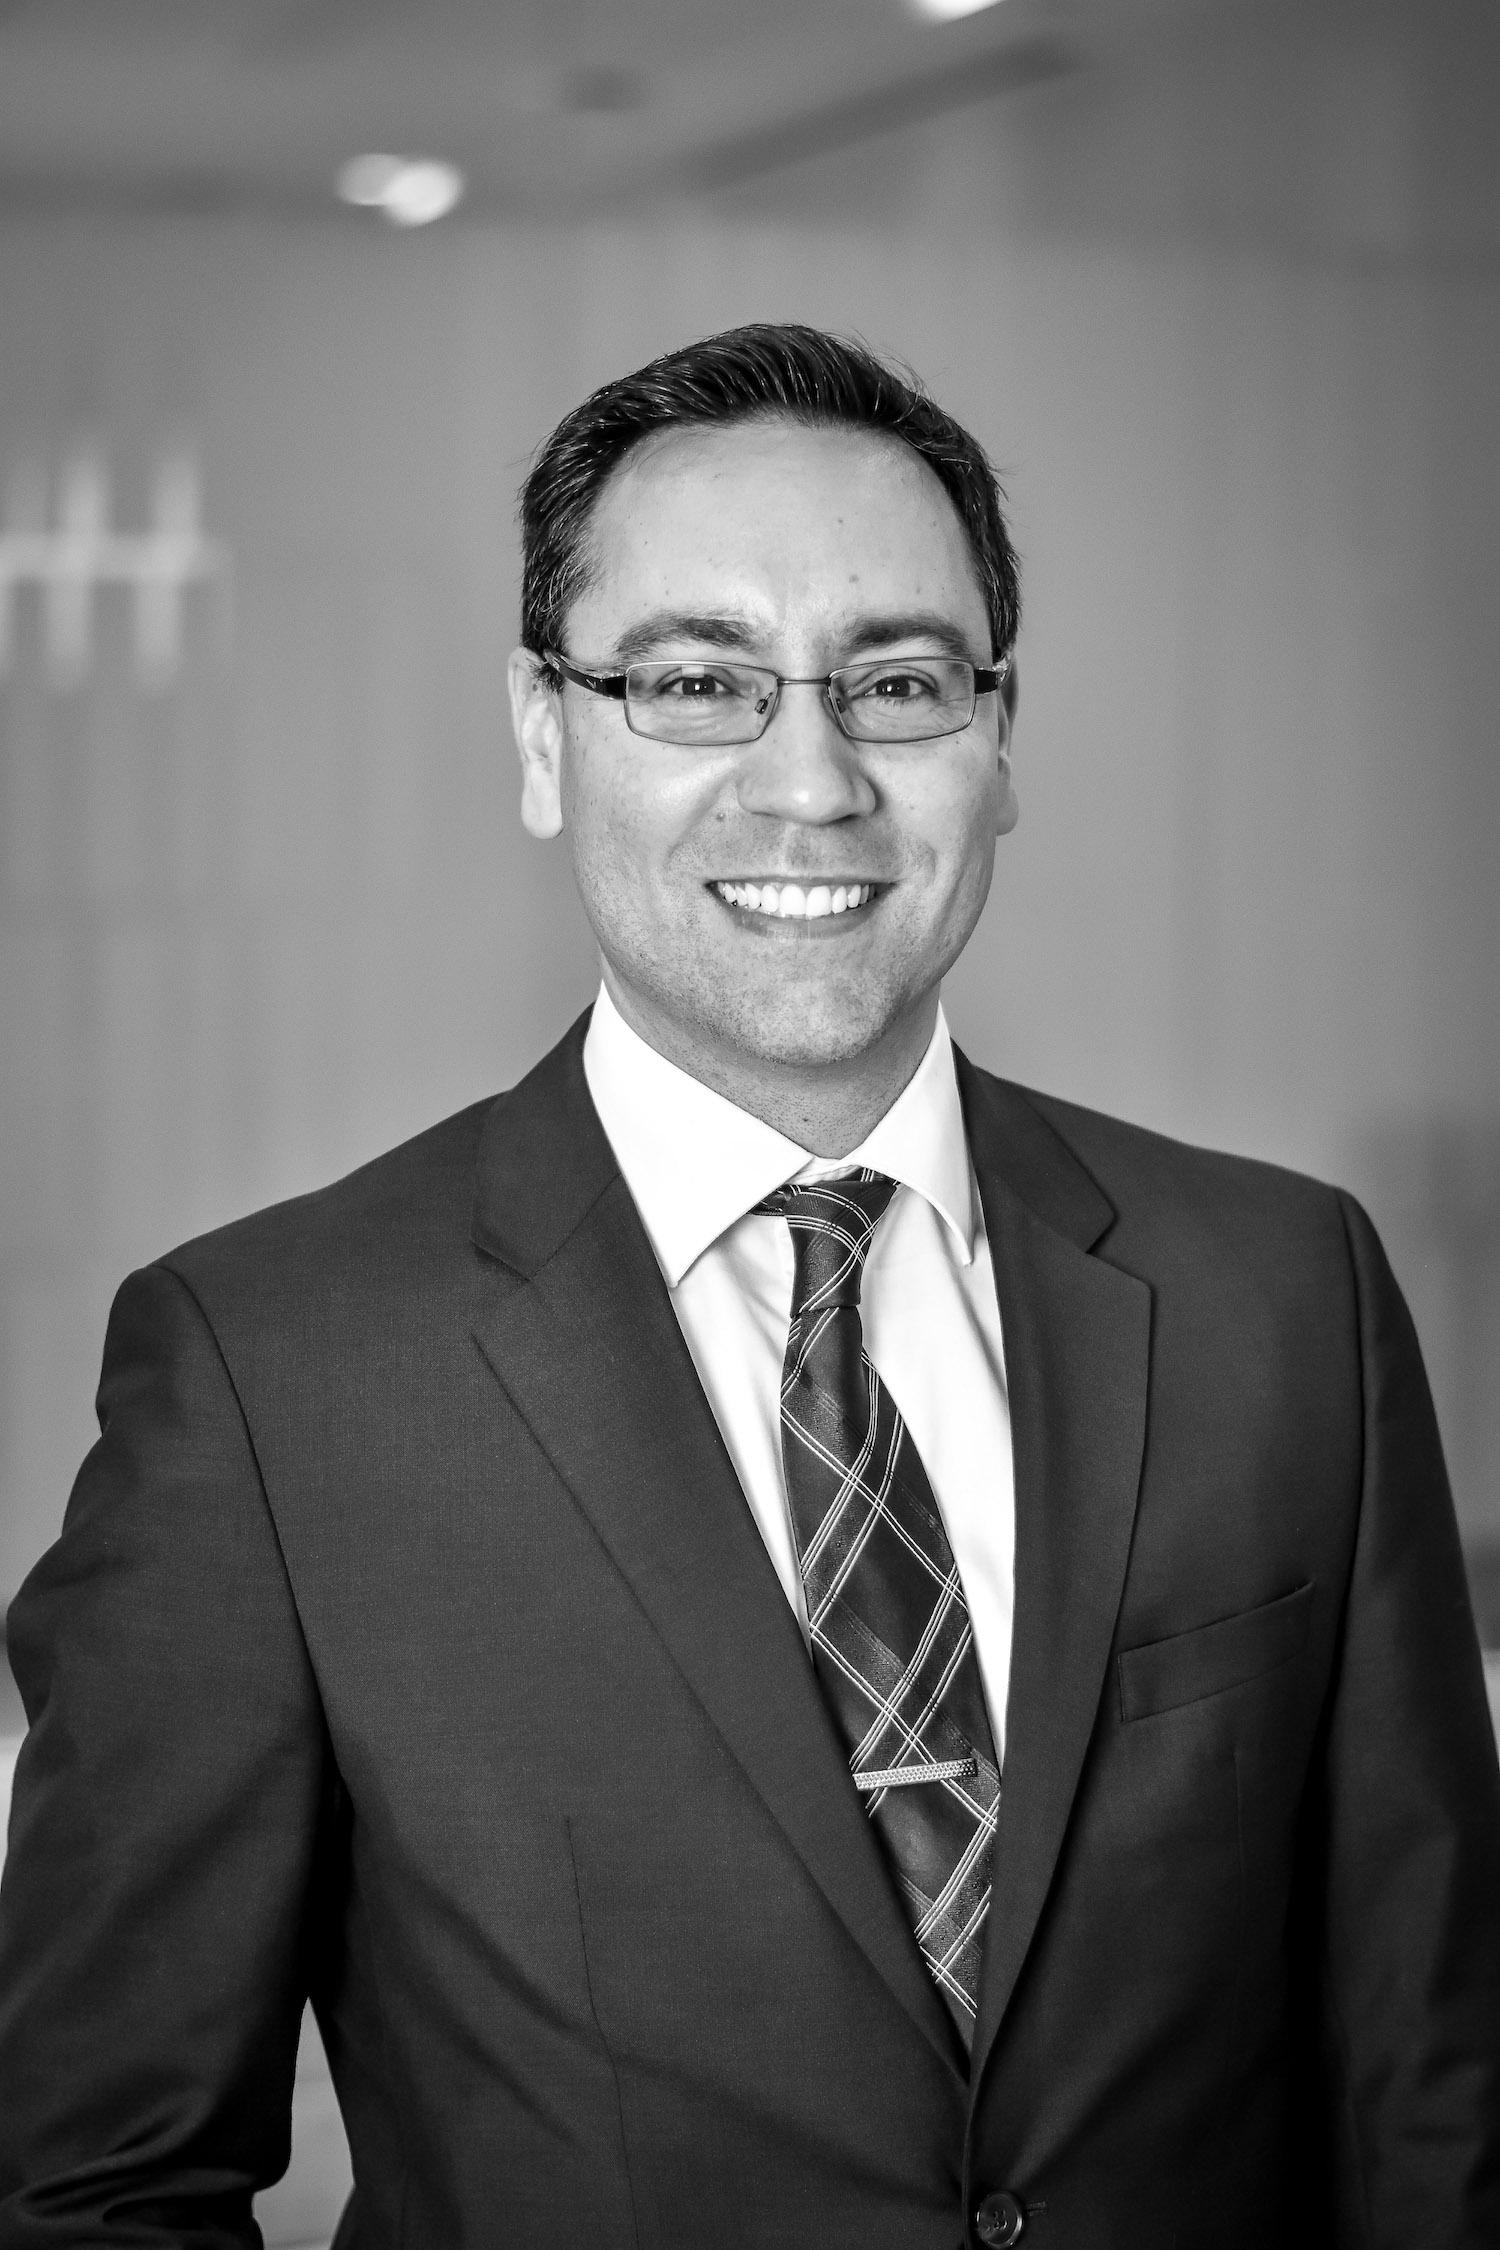 M. Frédérick Proteau, CPA, CA, GP